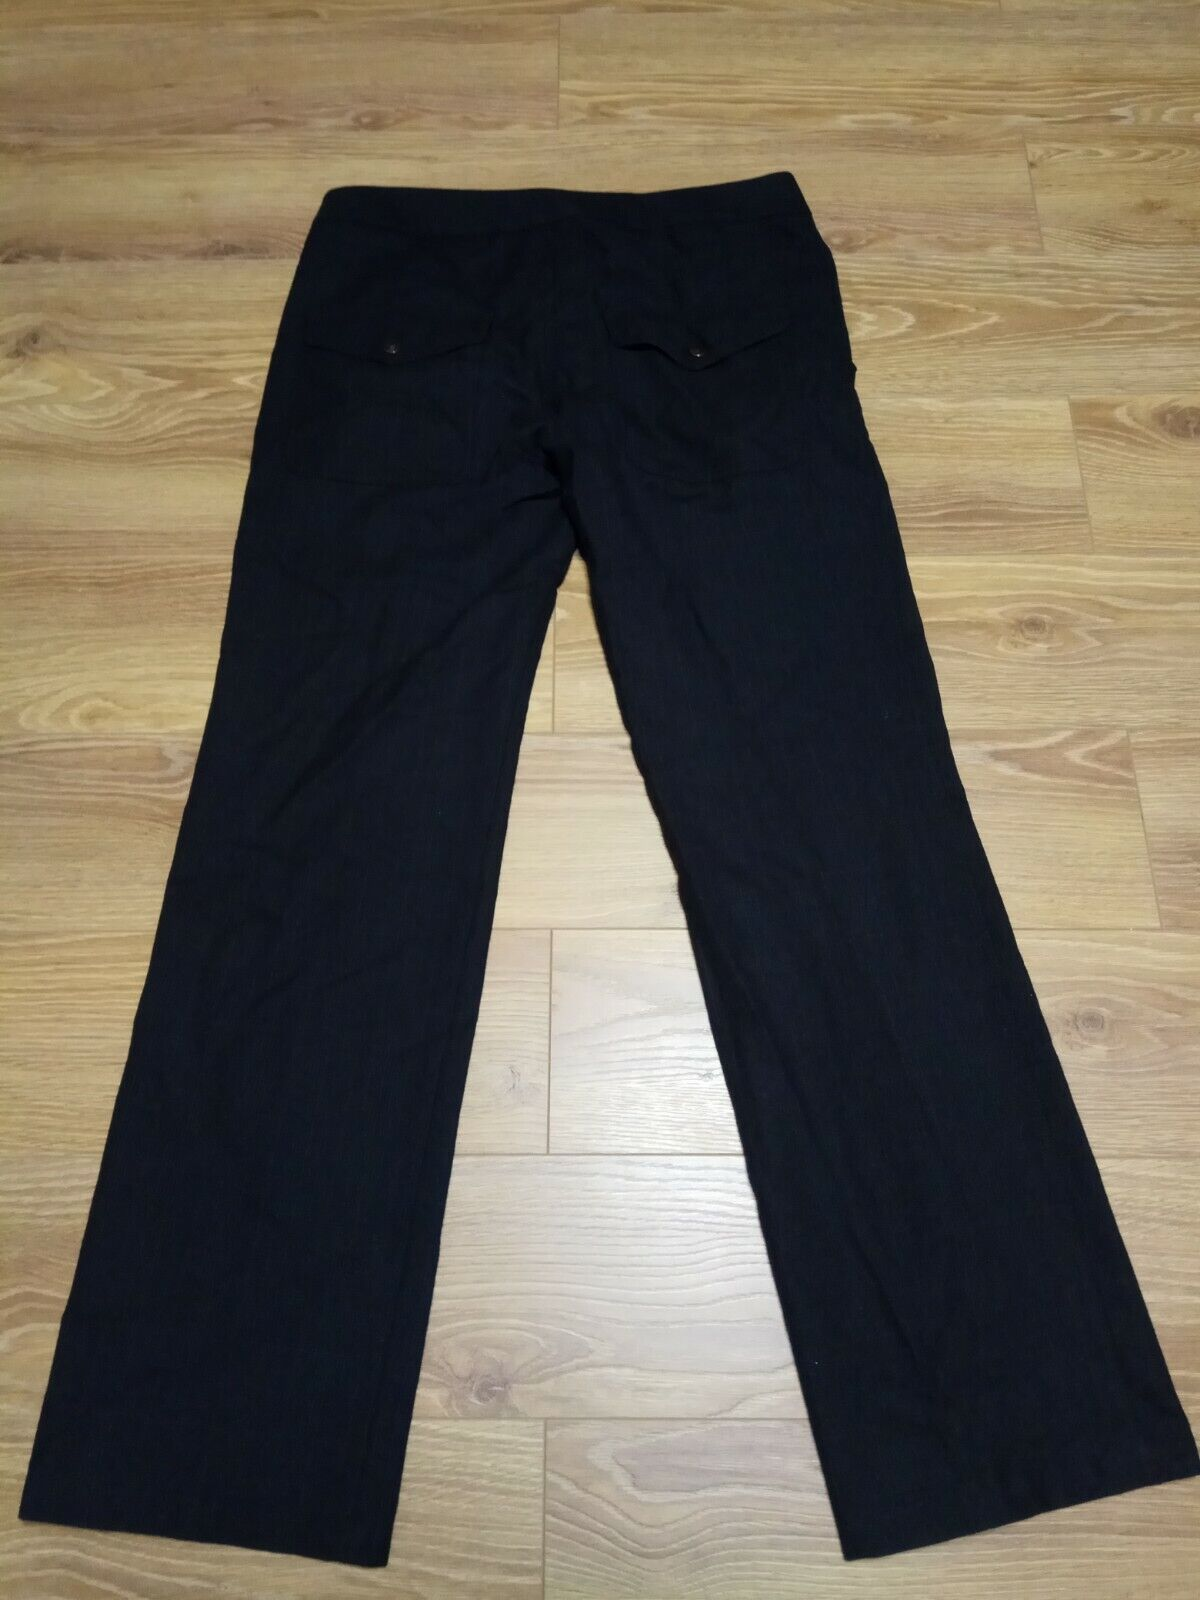 Hugo Boss James Black/grey Wool Dress Pants Micro… - image 6